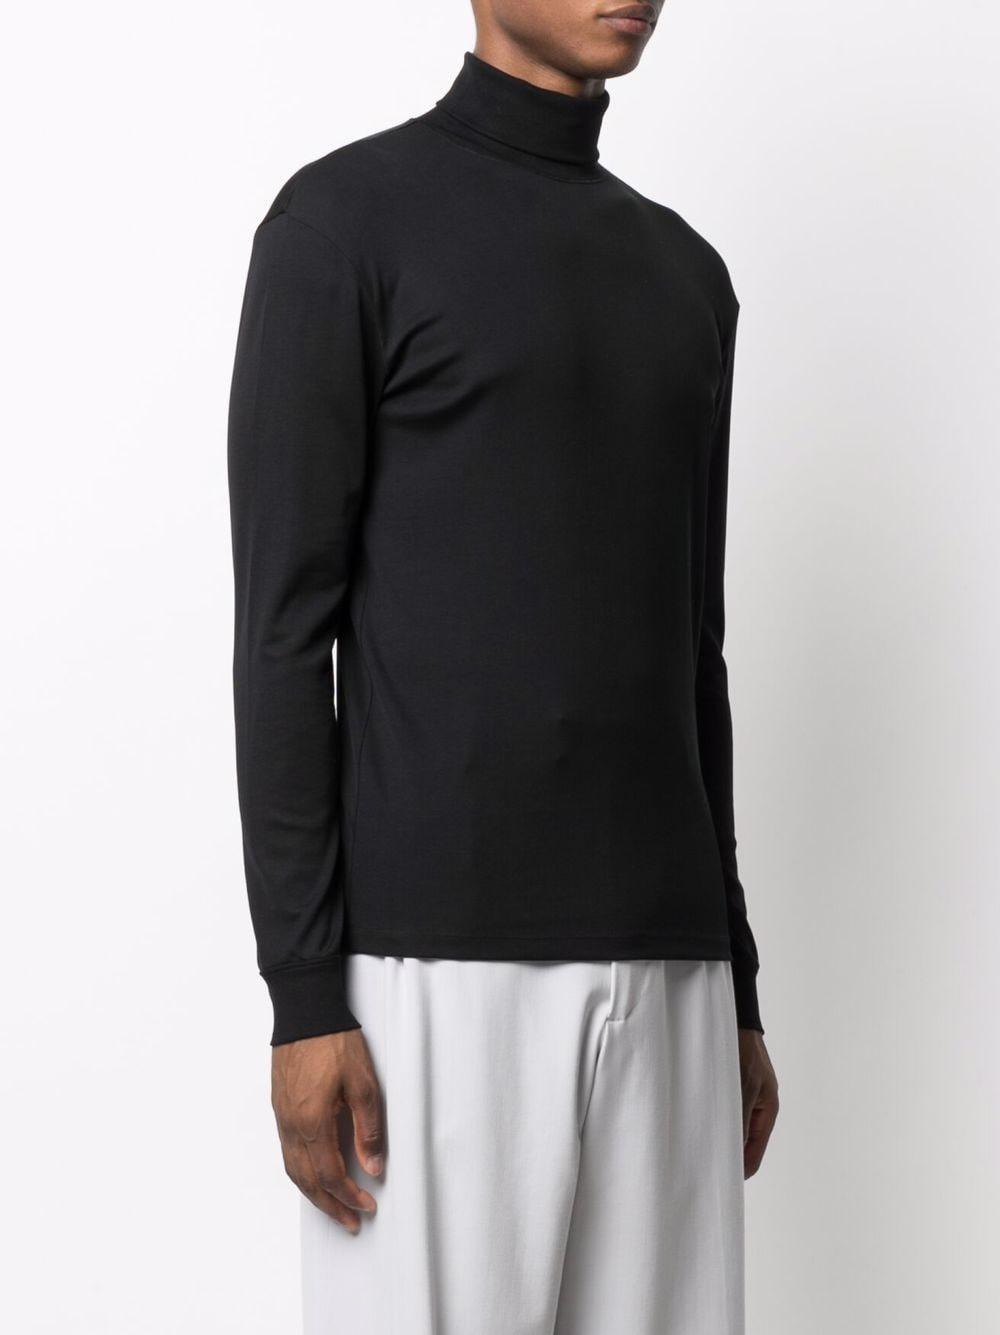 turtelneck t-shirt man black in cotton LEMAIRE | T-shirts | M 213 JE300 LJ060999